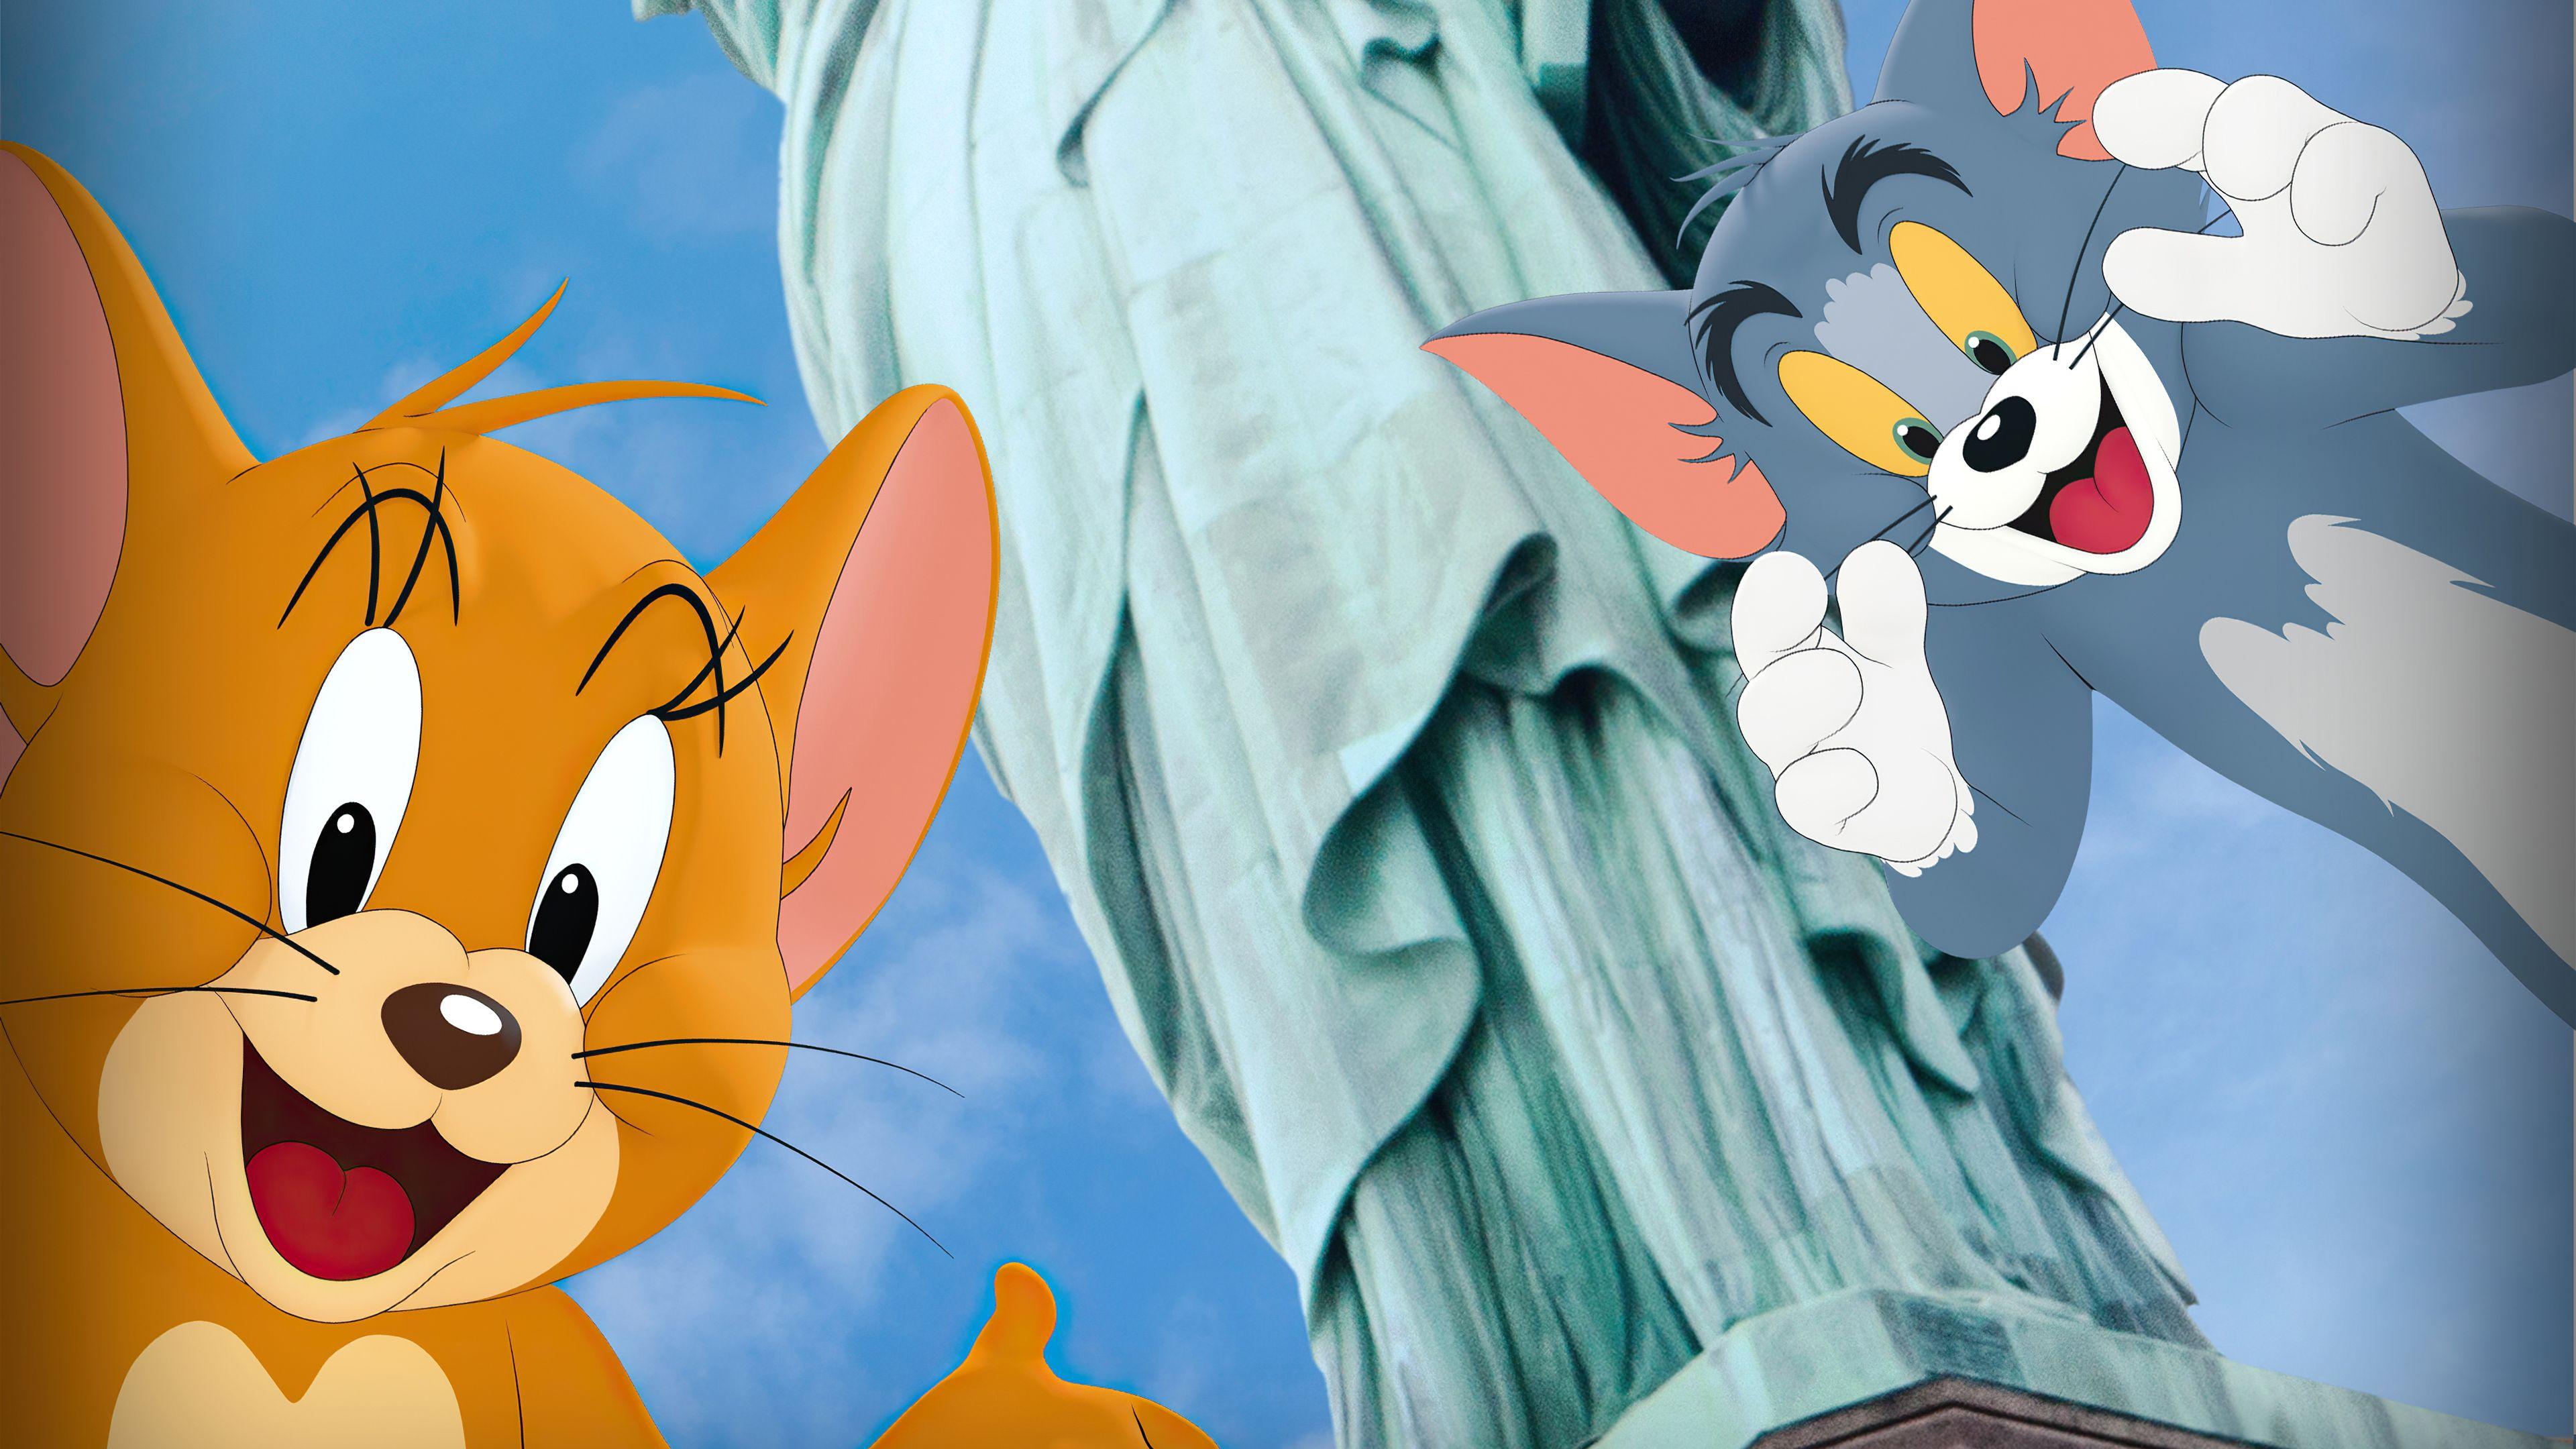 Guarda Tom Jerry Film Completo Italiano In 2021 Tom And Jerry Tom And Jerry Movies Film Pokemon